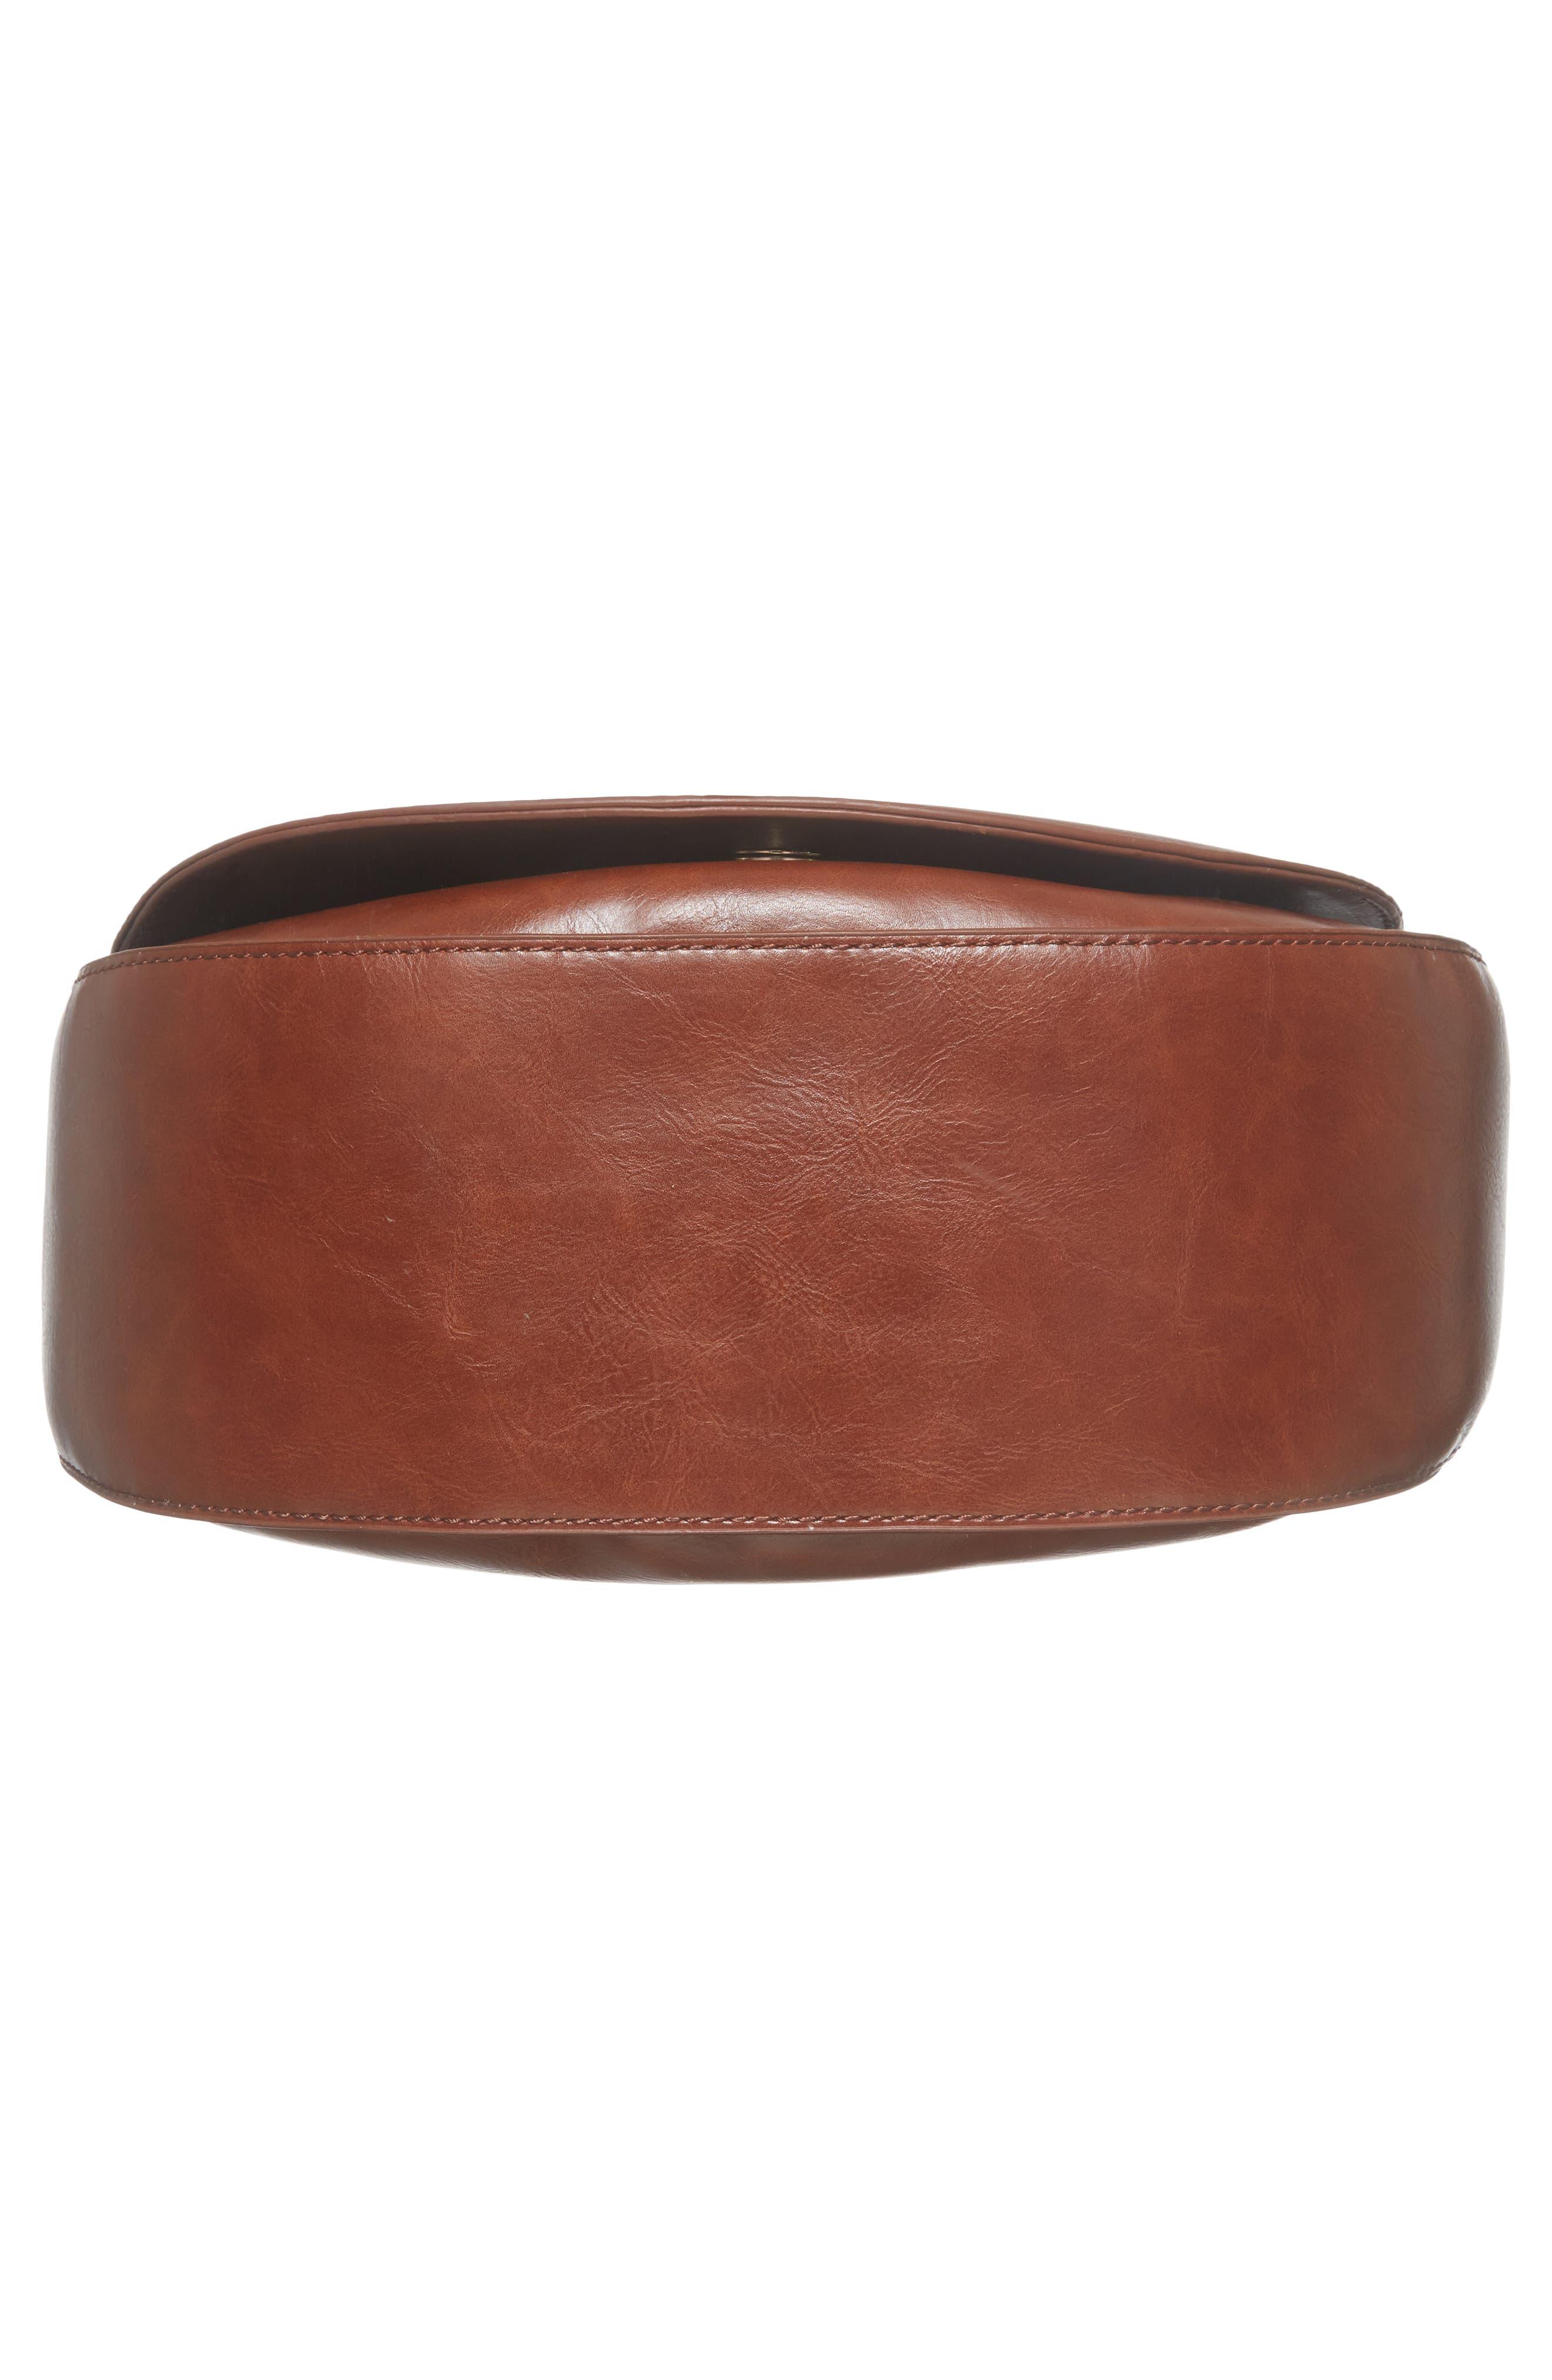 Piri Faux Leather Saddle Bag,                             Alternate thumbnail 18, color,